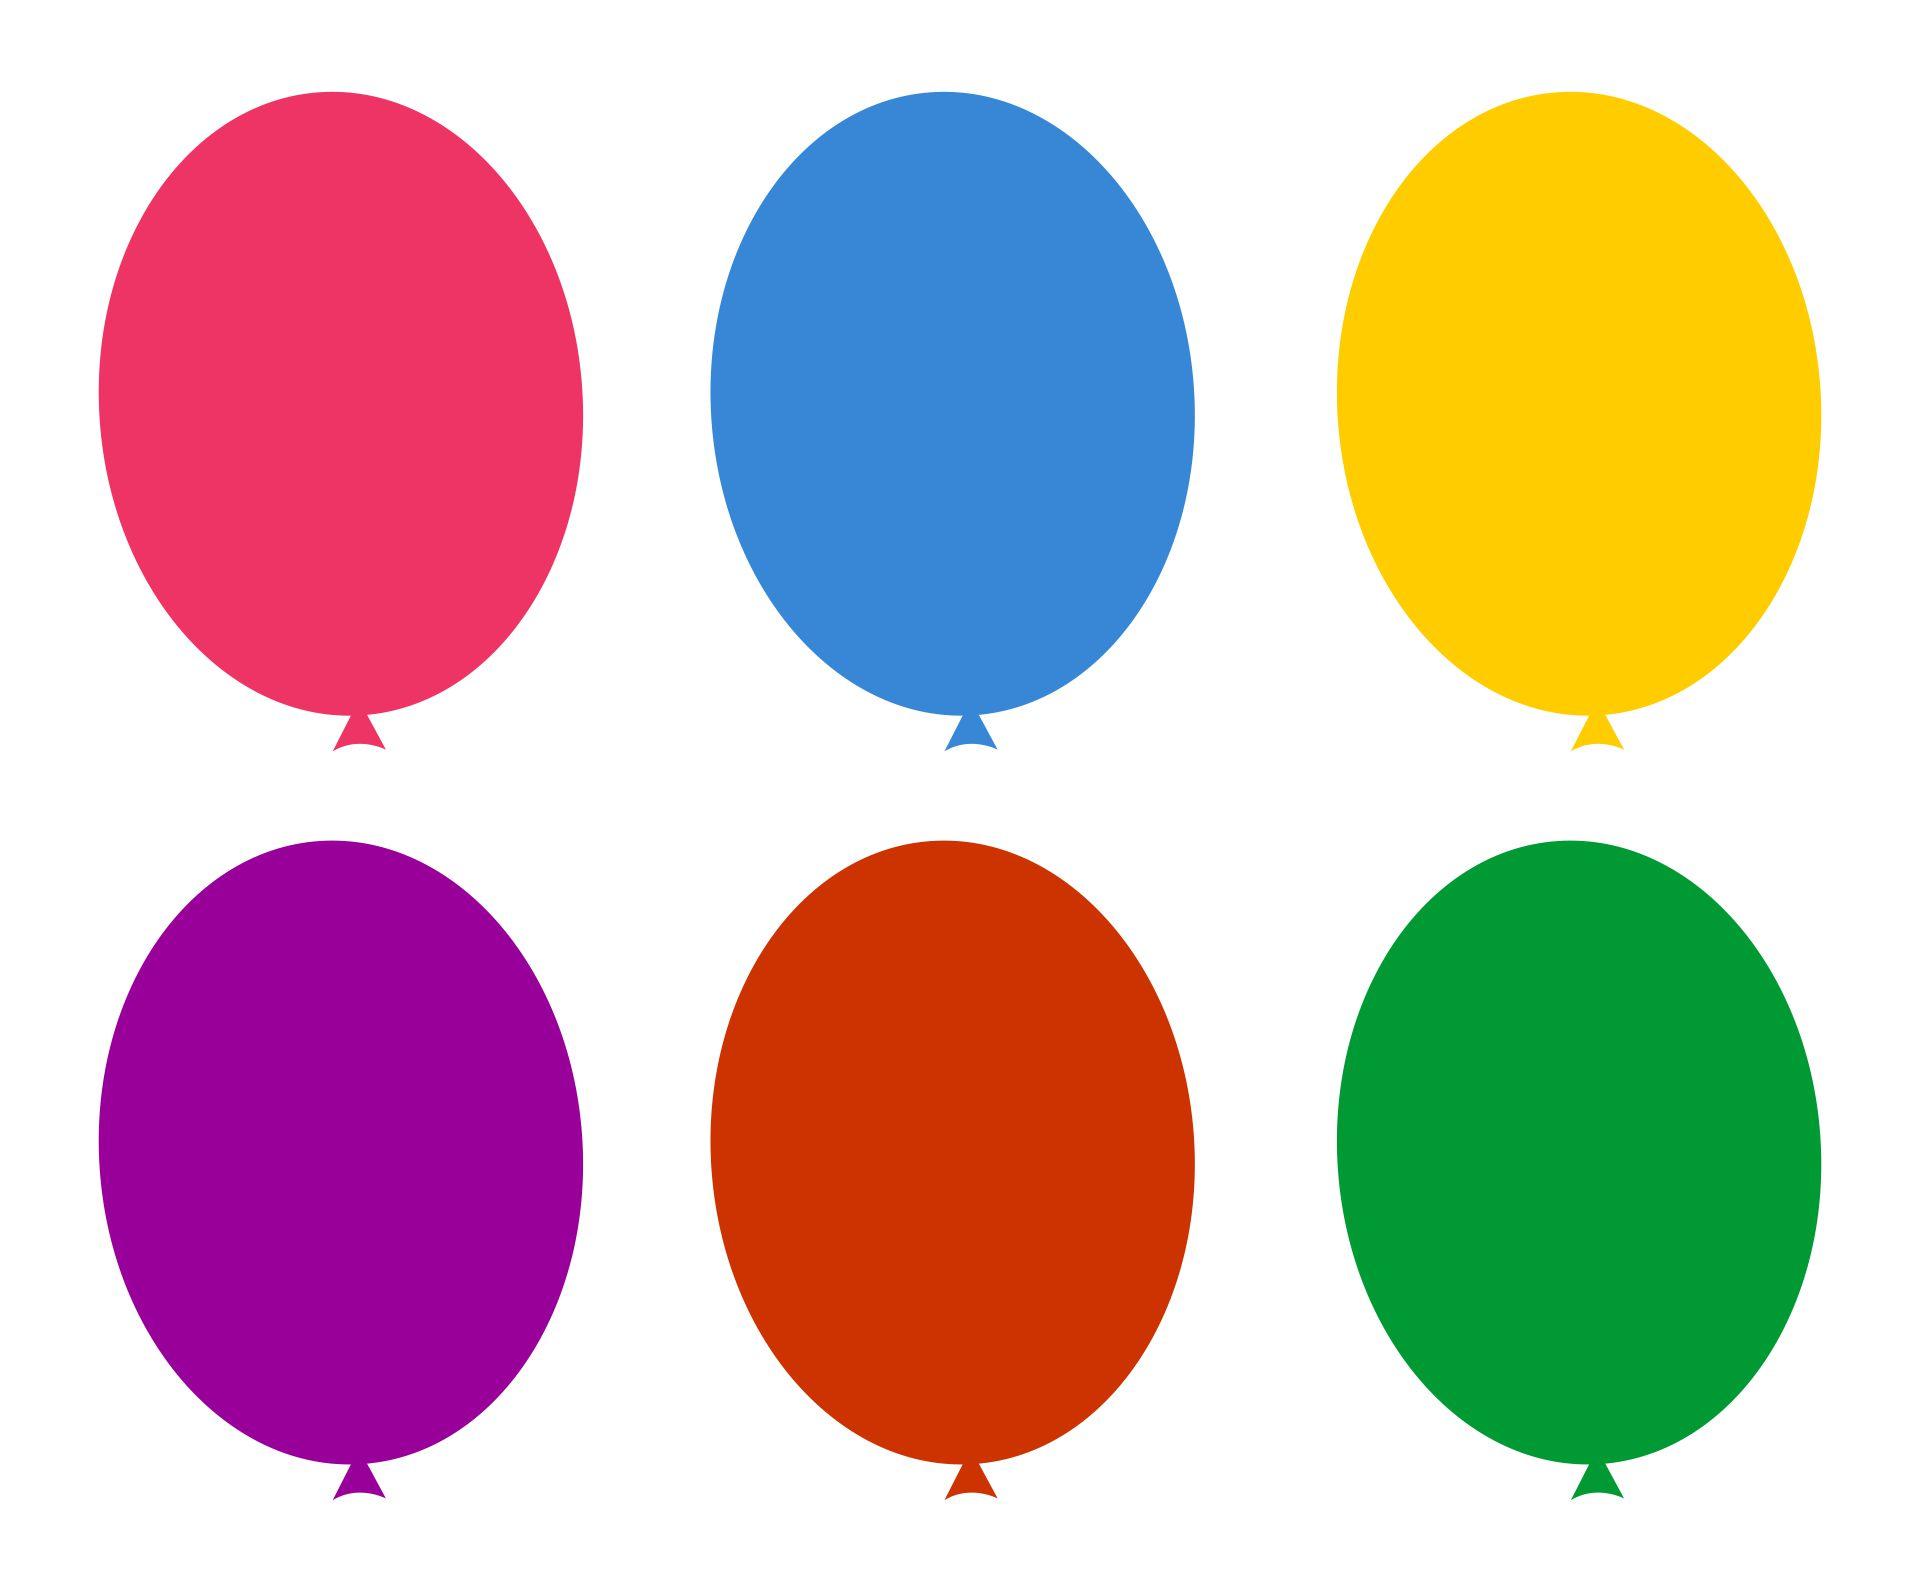 Free Printable Birthday Balloon Template